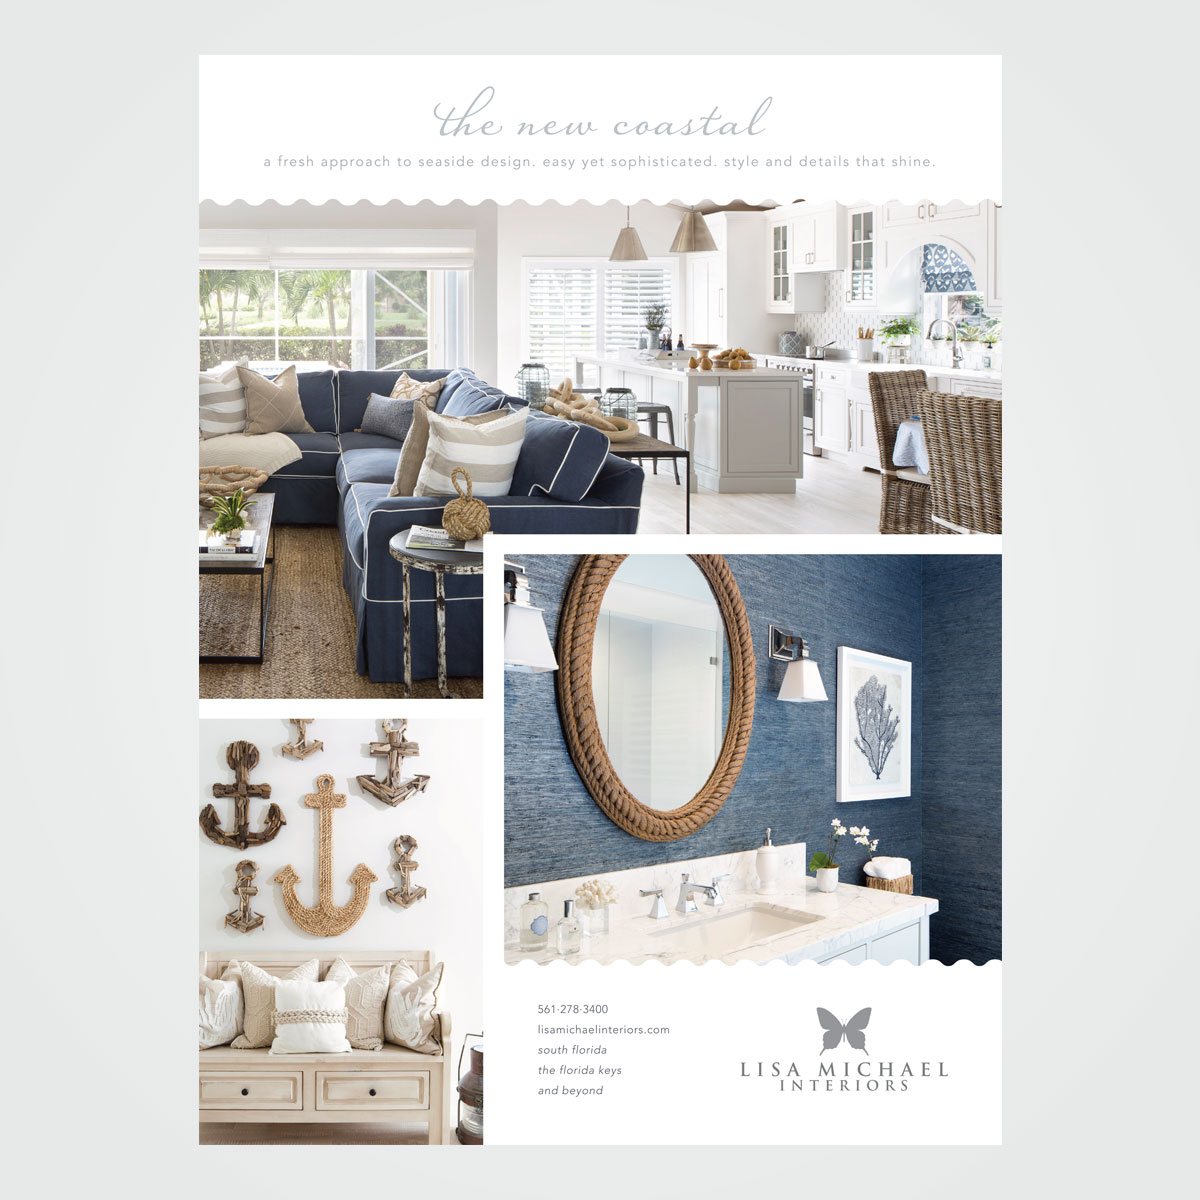 Magazine ad for Lisa Michael Interiors, a Florida-based interior design firm